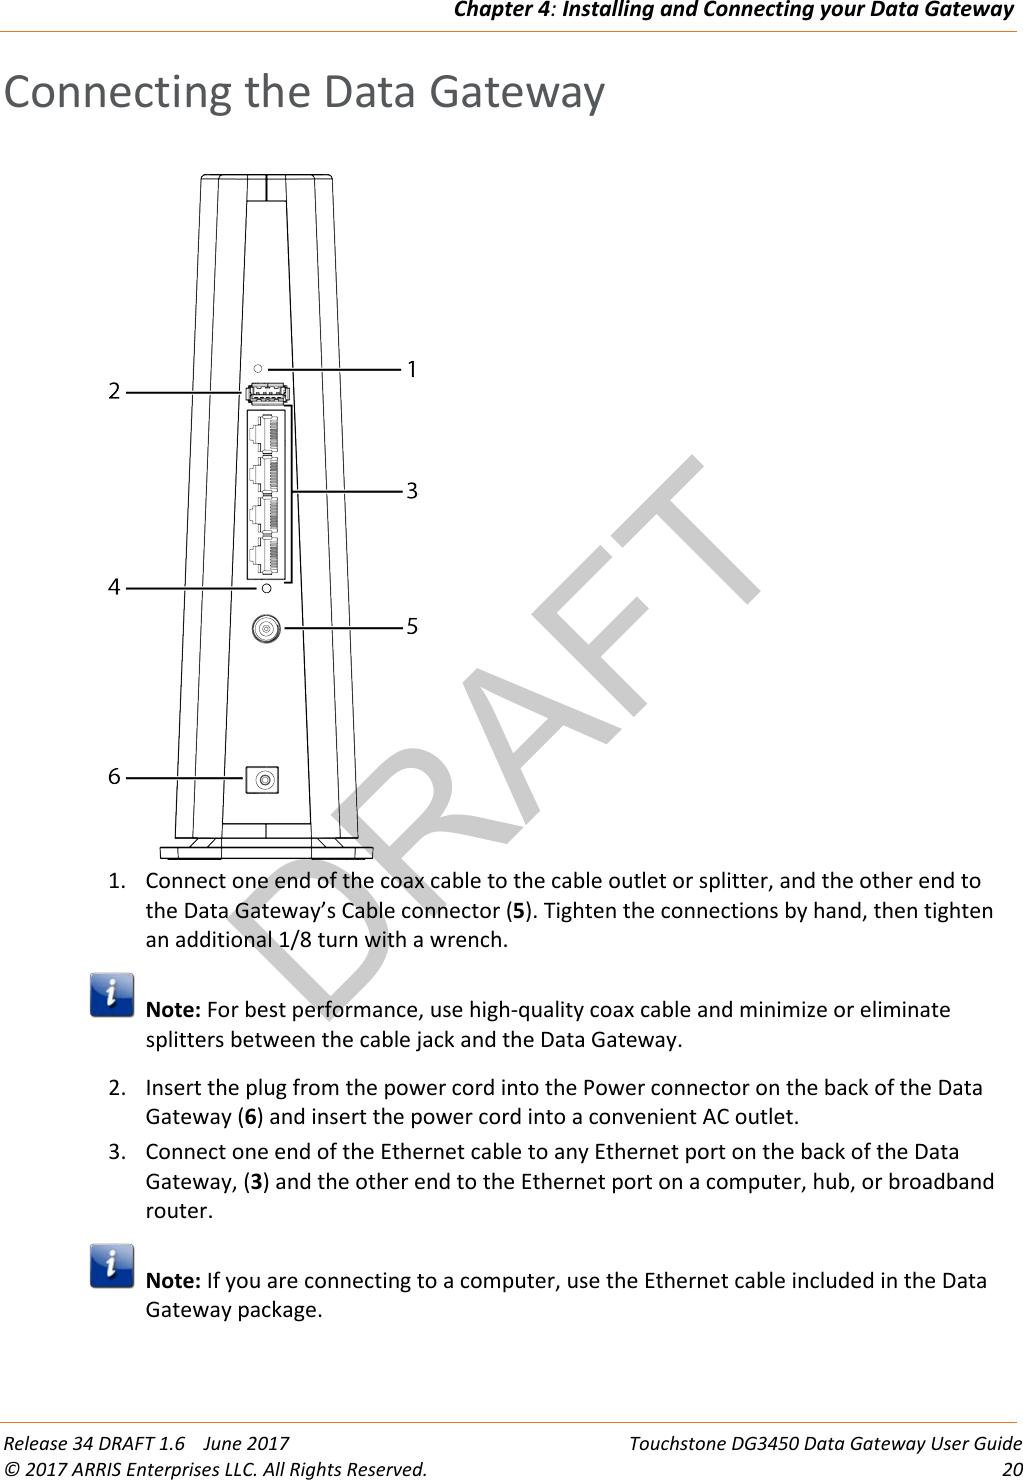 prestashop 1.6 user guide pdf download